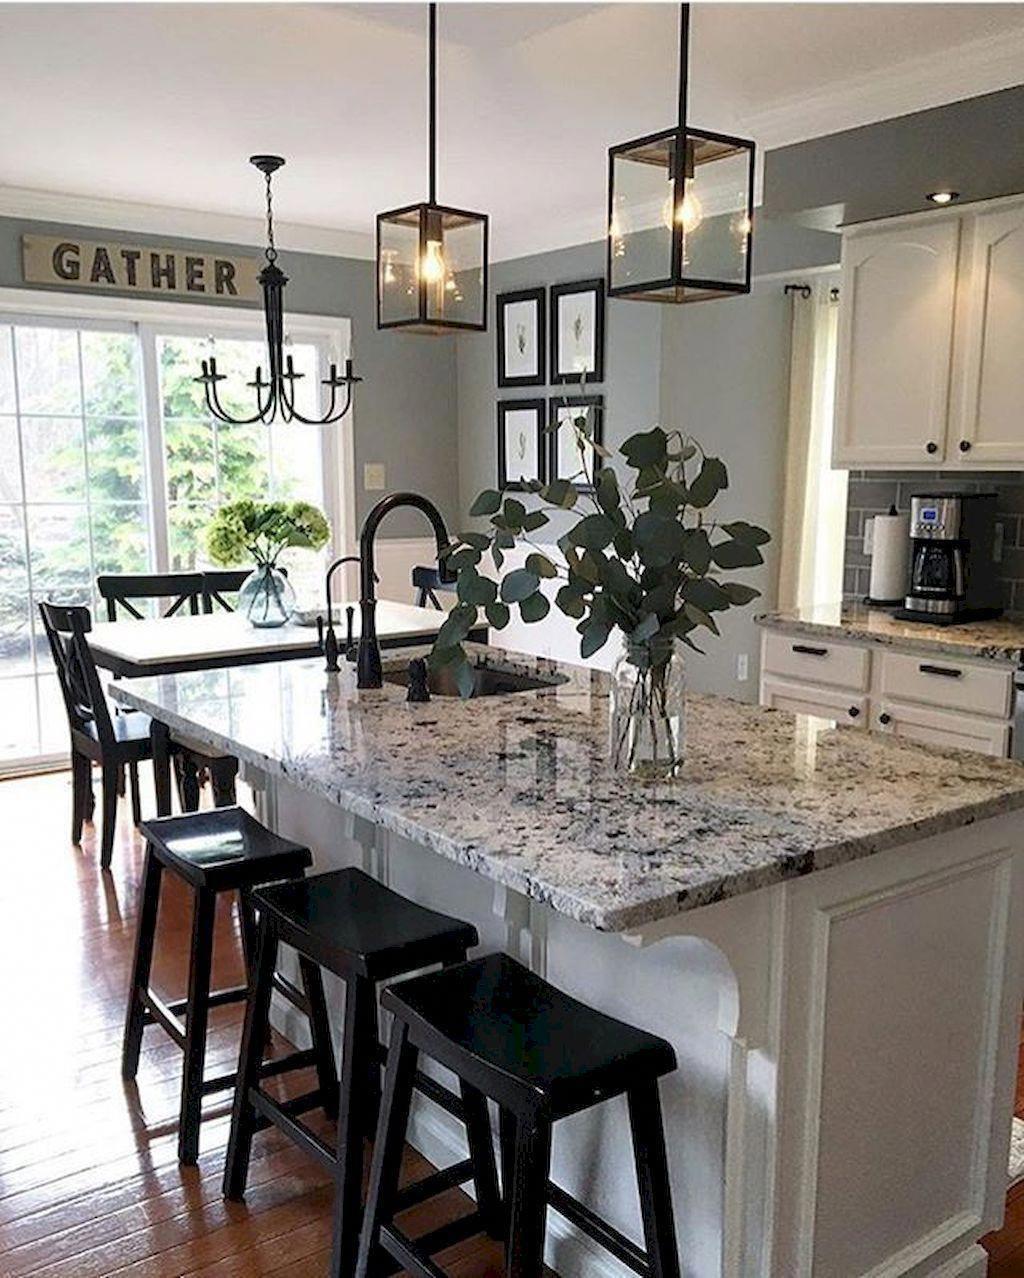 affordable kitchen cabinets online kitchen cabinets in 2019 rh pinterest com